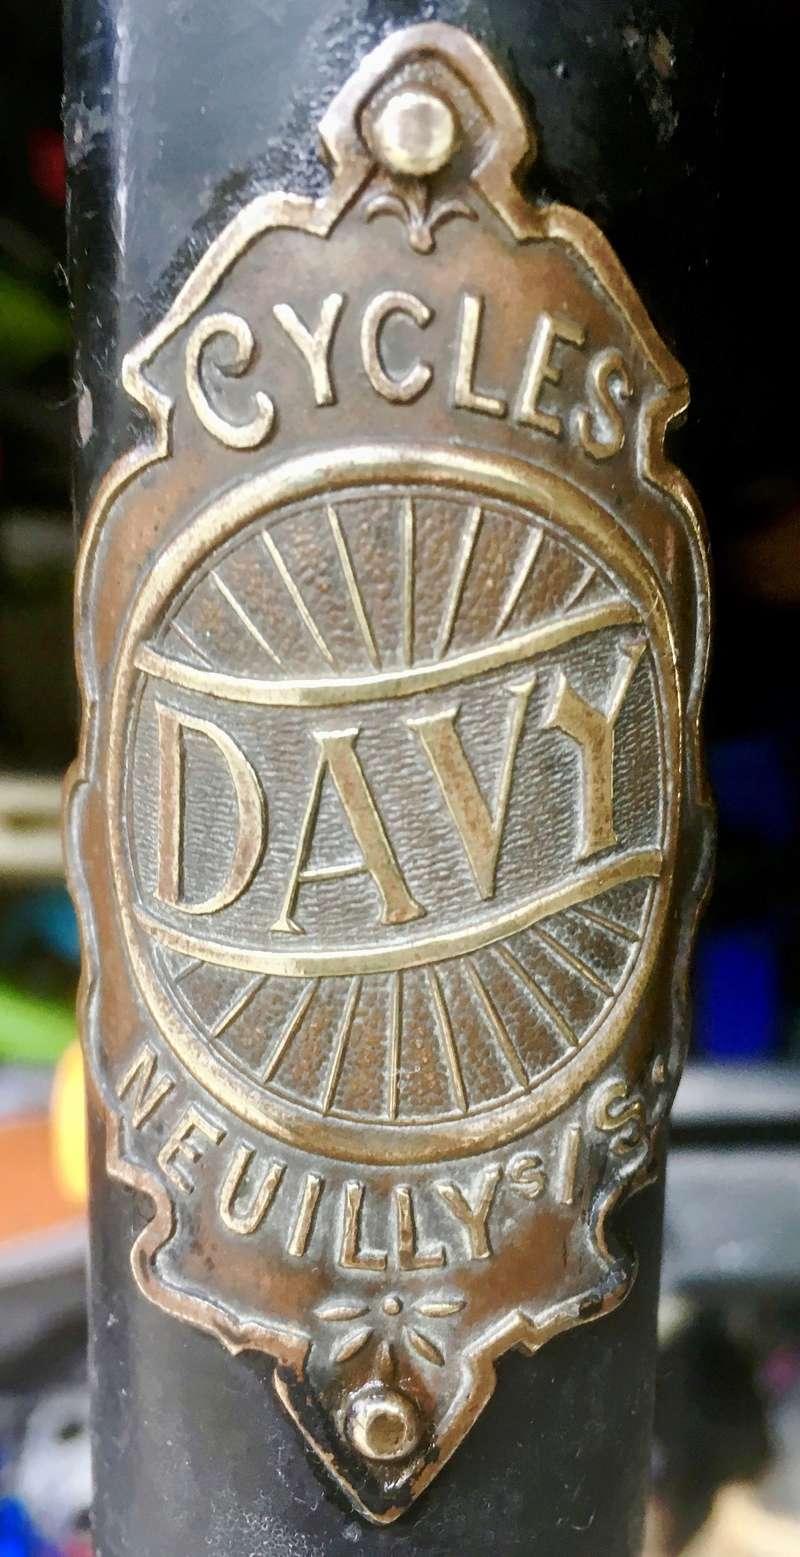 Davy de Neuilly - Page 2 Fullsi14